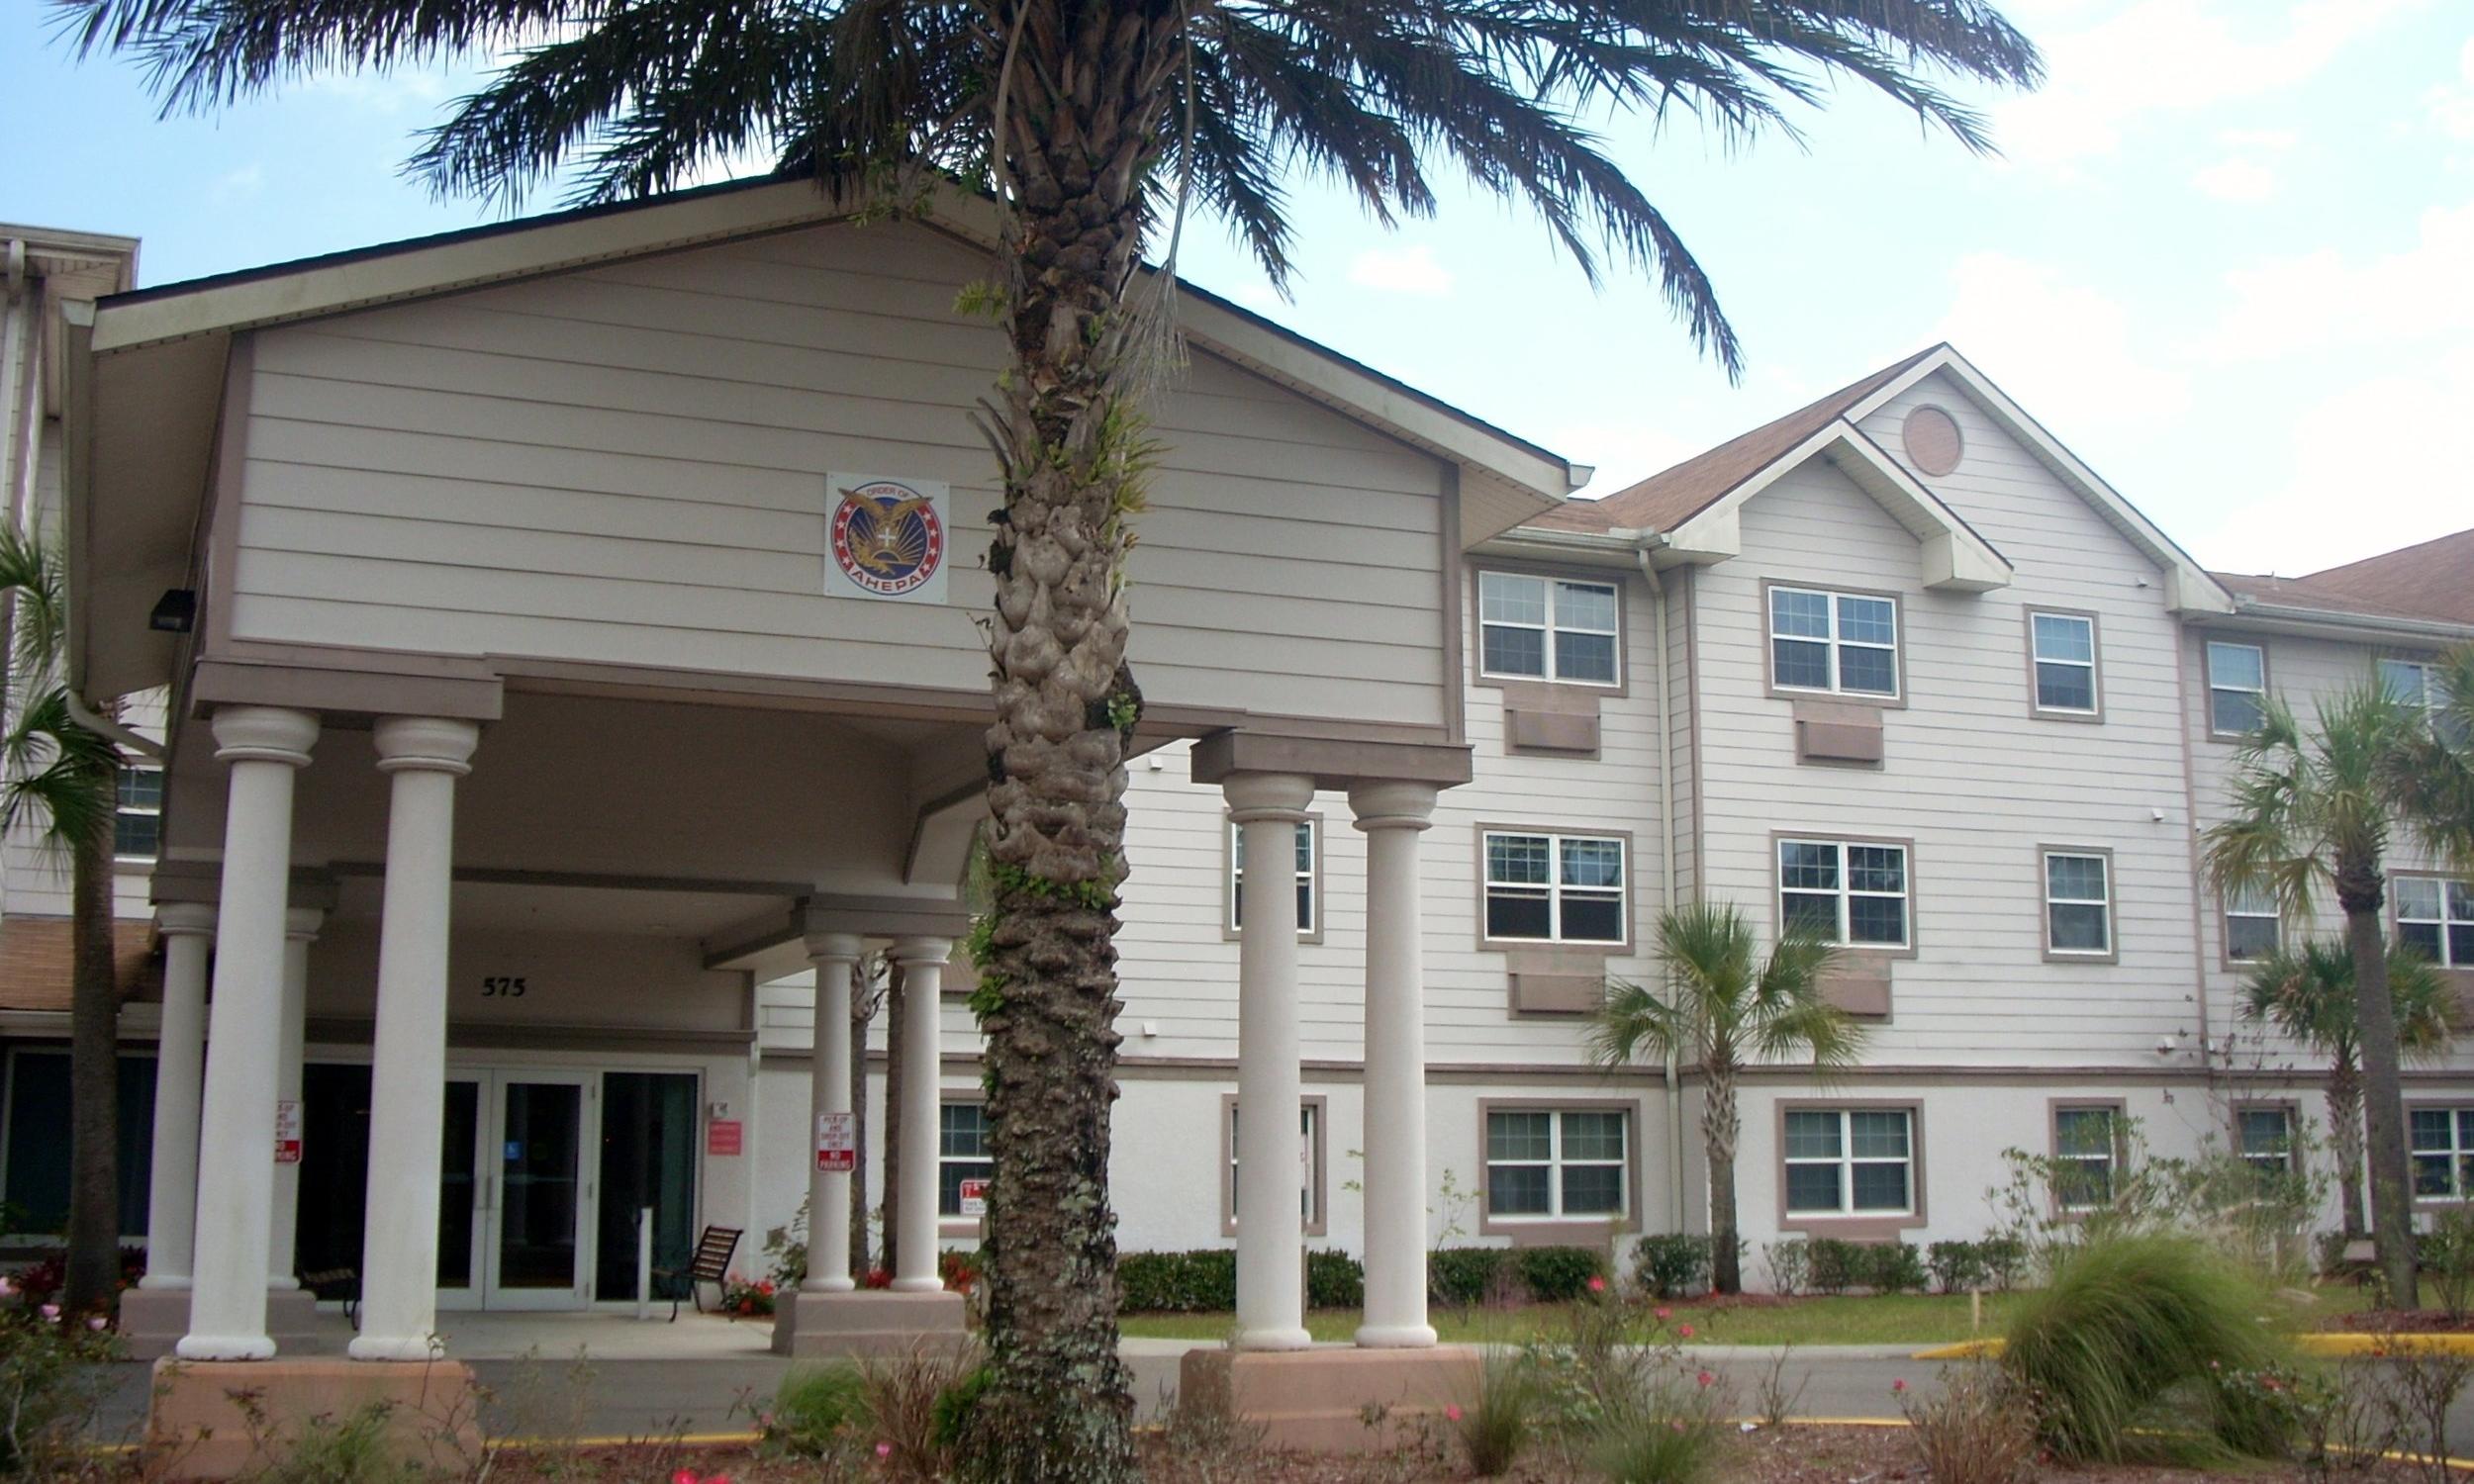 AHEPA 410 Senior Apartments - 575 N. Williamson Blvd.Daytona Beach, FL 32114(386) 258-6100TTY: (800) 955-8771 or 711 (English)TTY: (877) 955-8773 or 711 (Español)info@ahepahousing.org